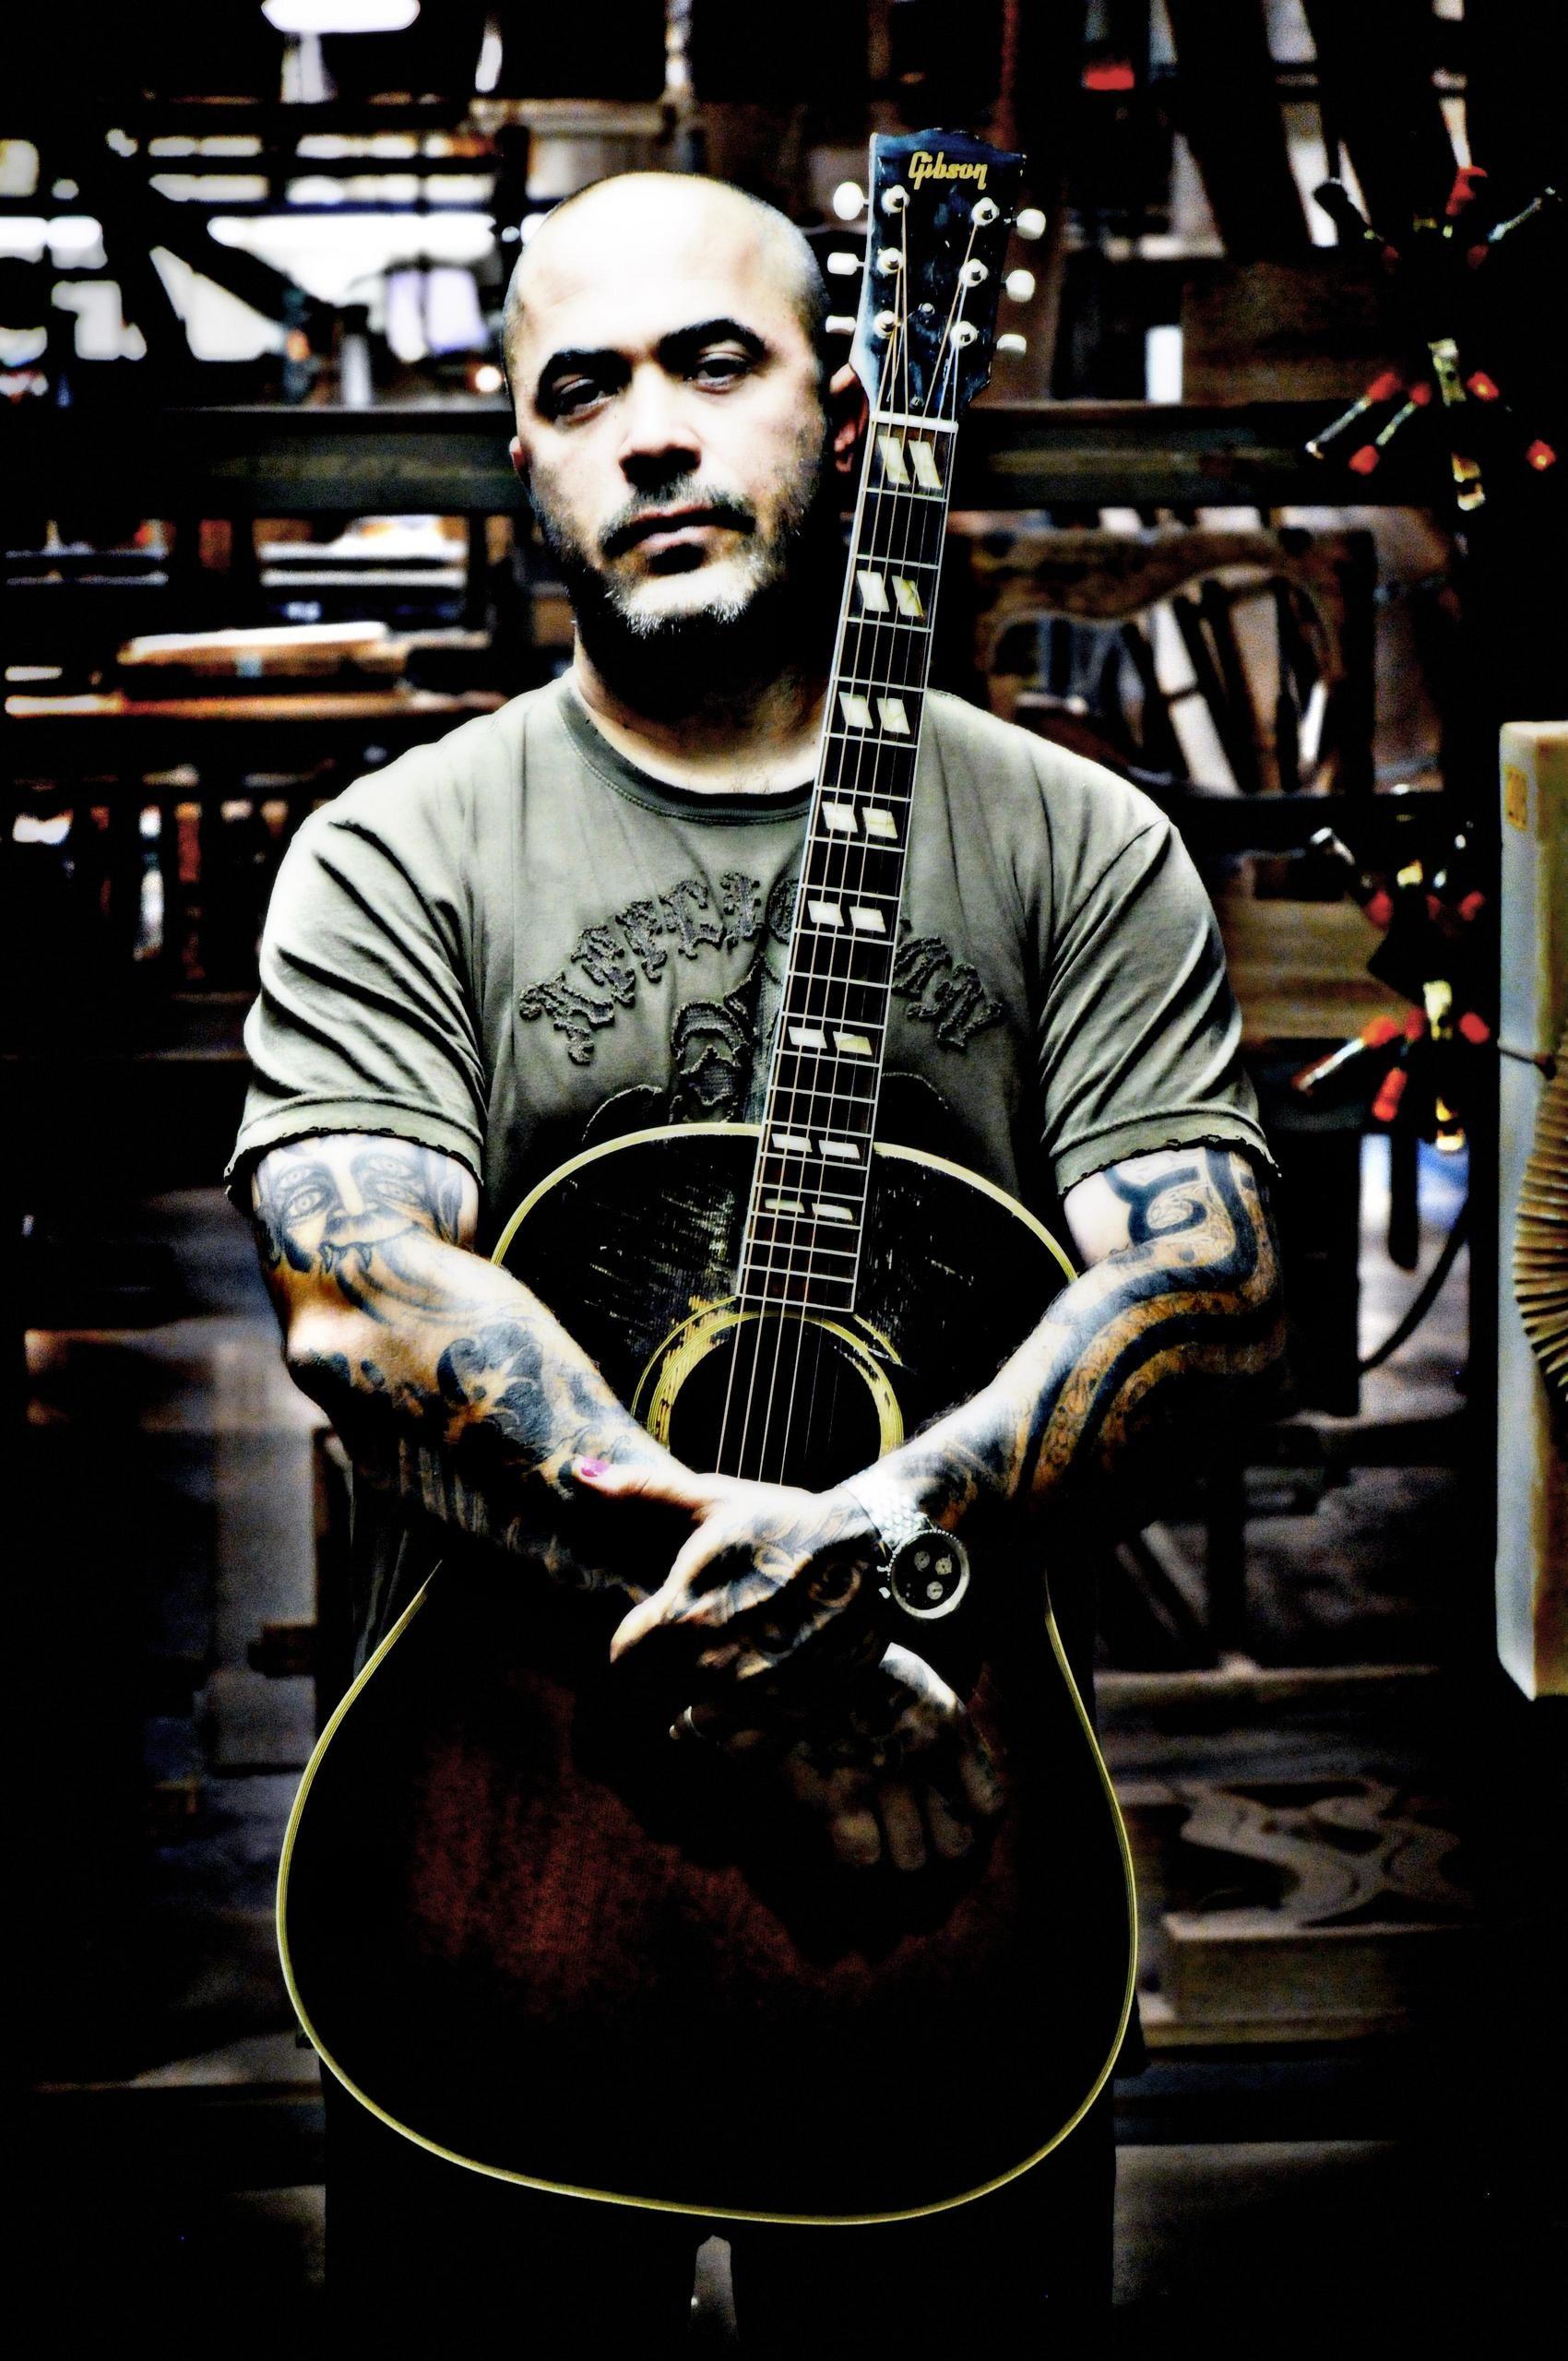 aaron lewis staind guitars in 2018 music acoustic guitar